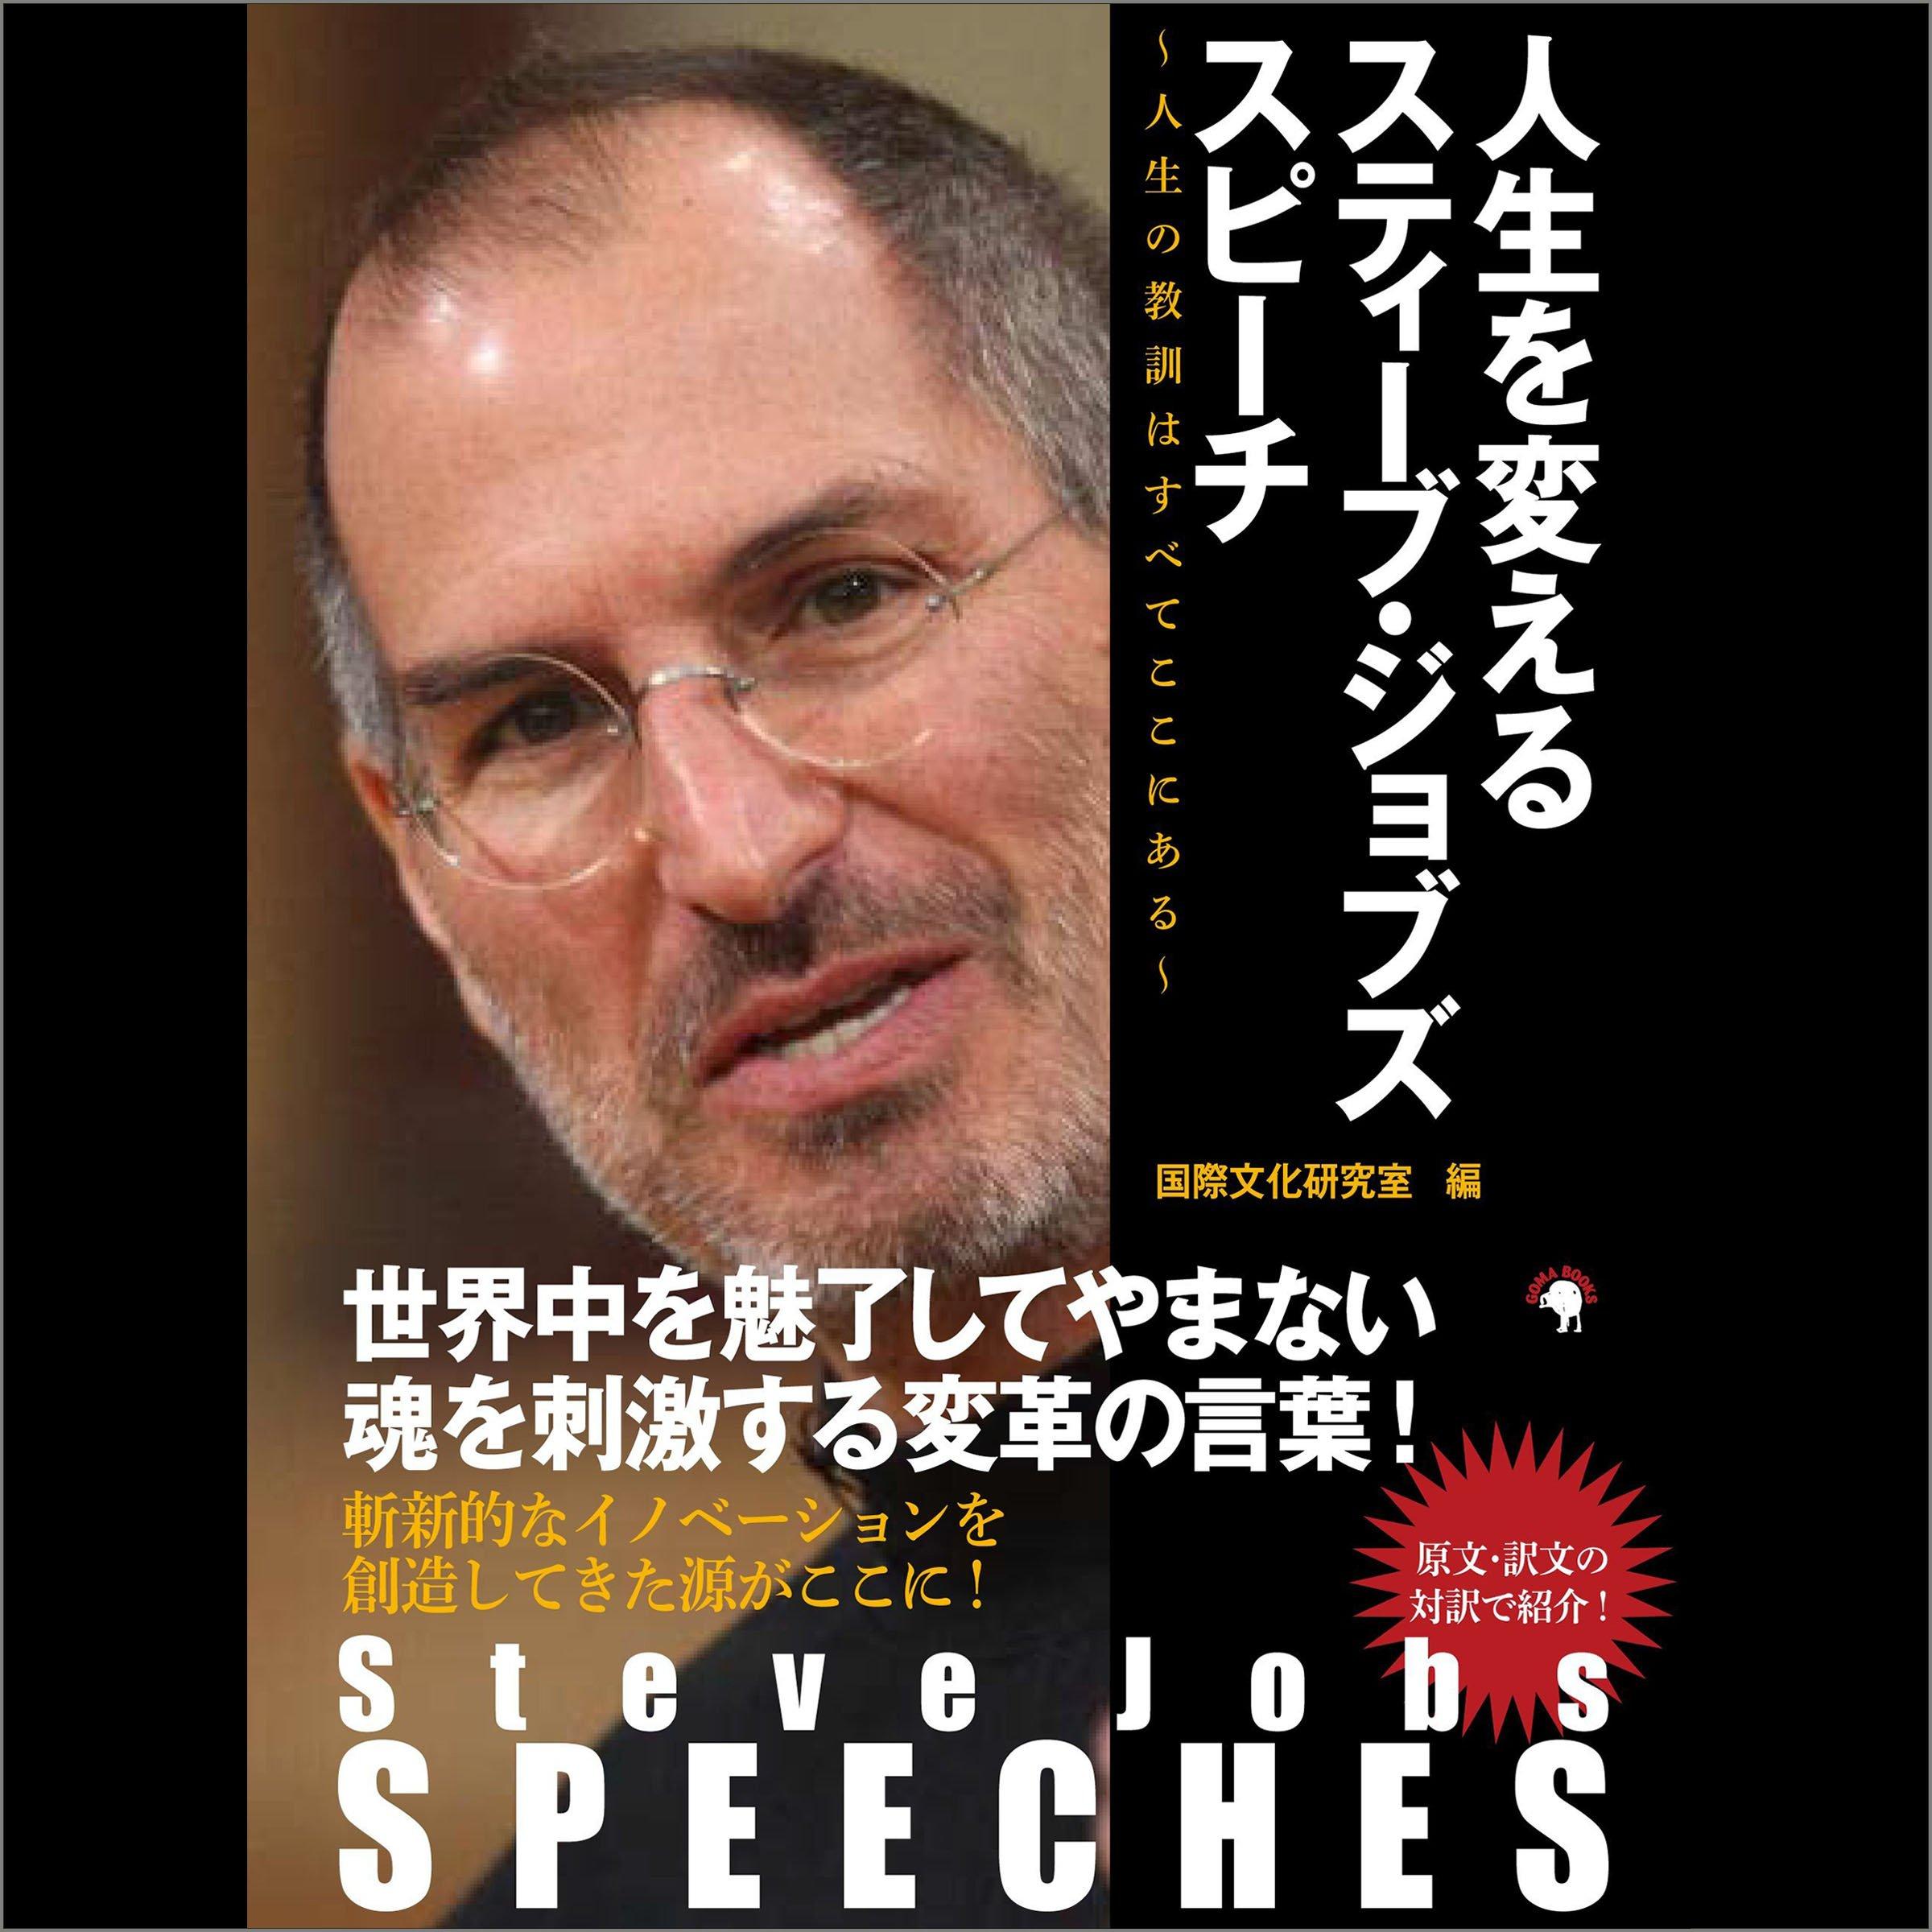 Steve Jobs SPEECHES 人生を変えるスティーブ・ジョブズ スピーチ: ~人生の教訓はすべてここにある~